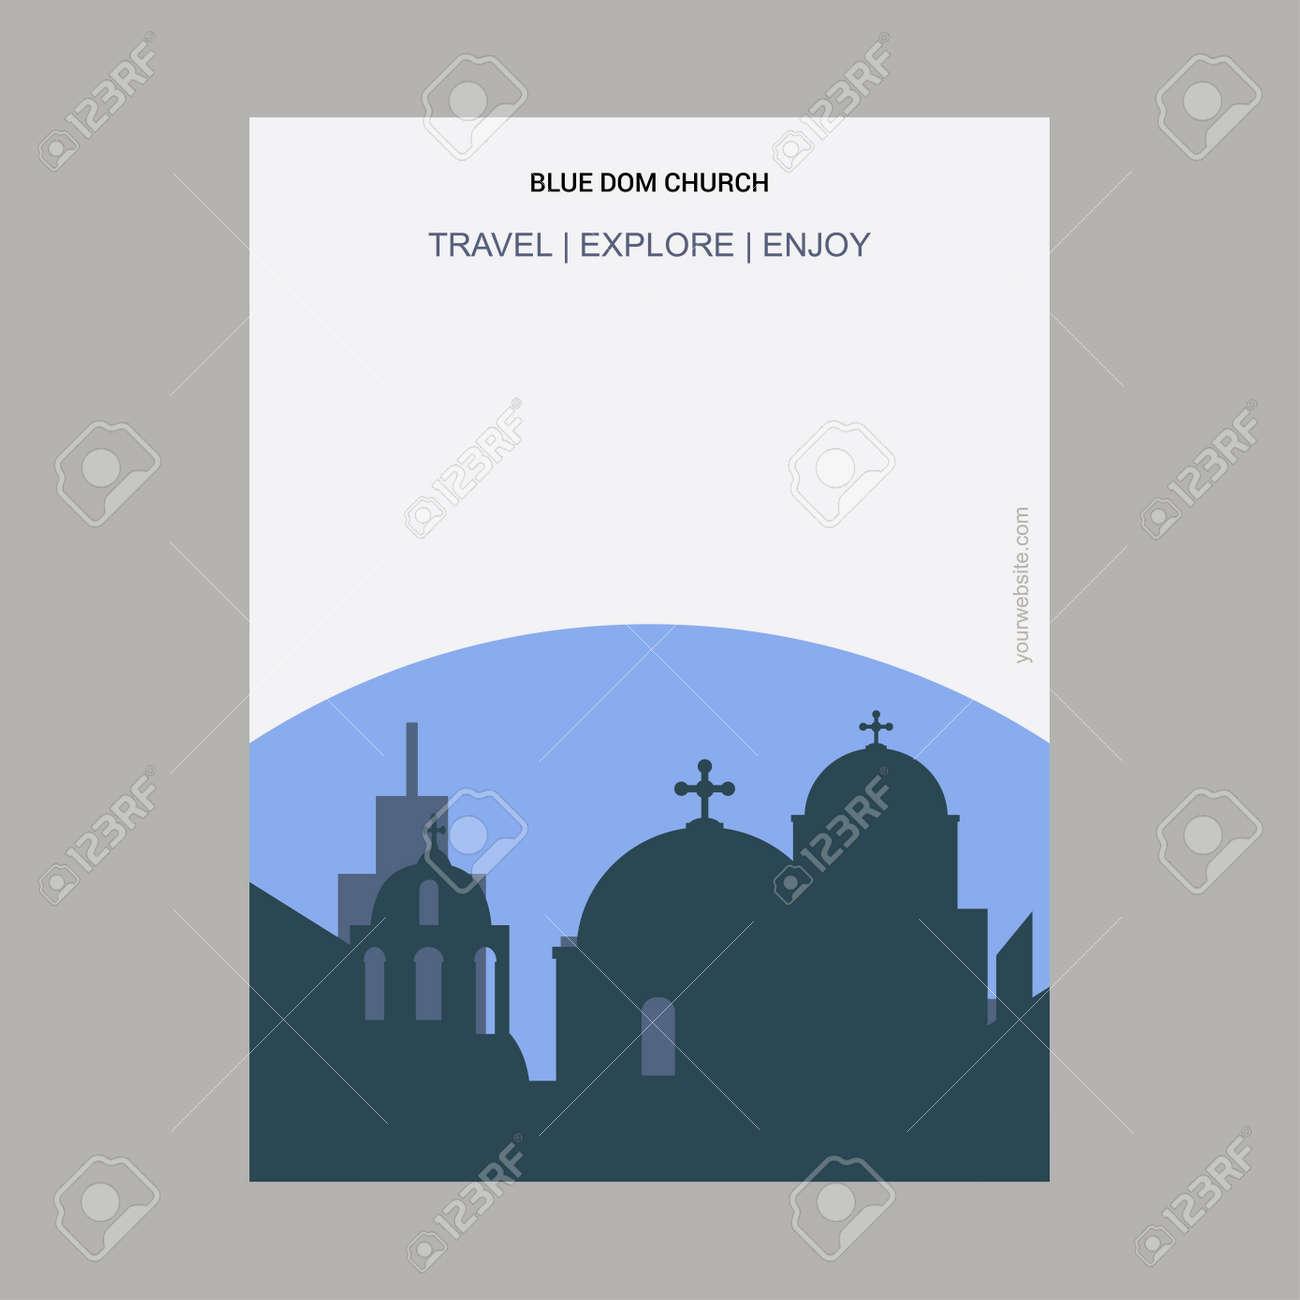 Blue Dom Church Slovakia Vintage Style Landmark Poster Template